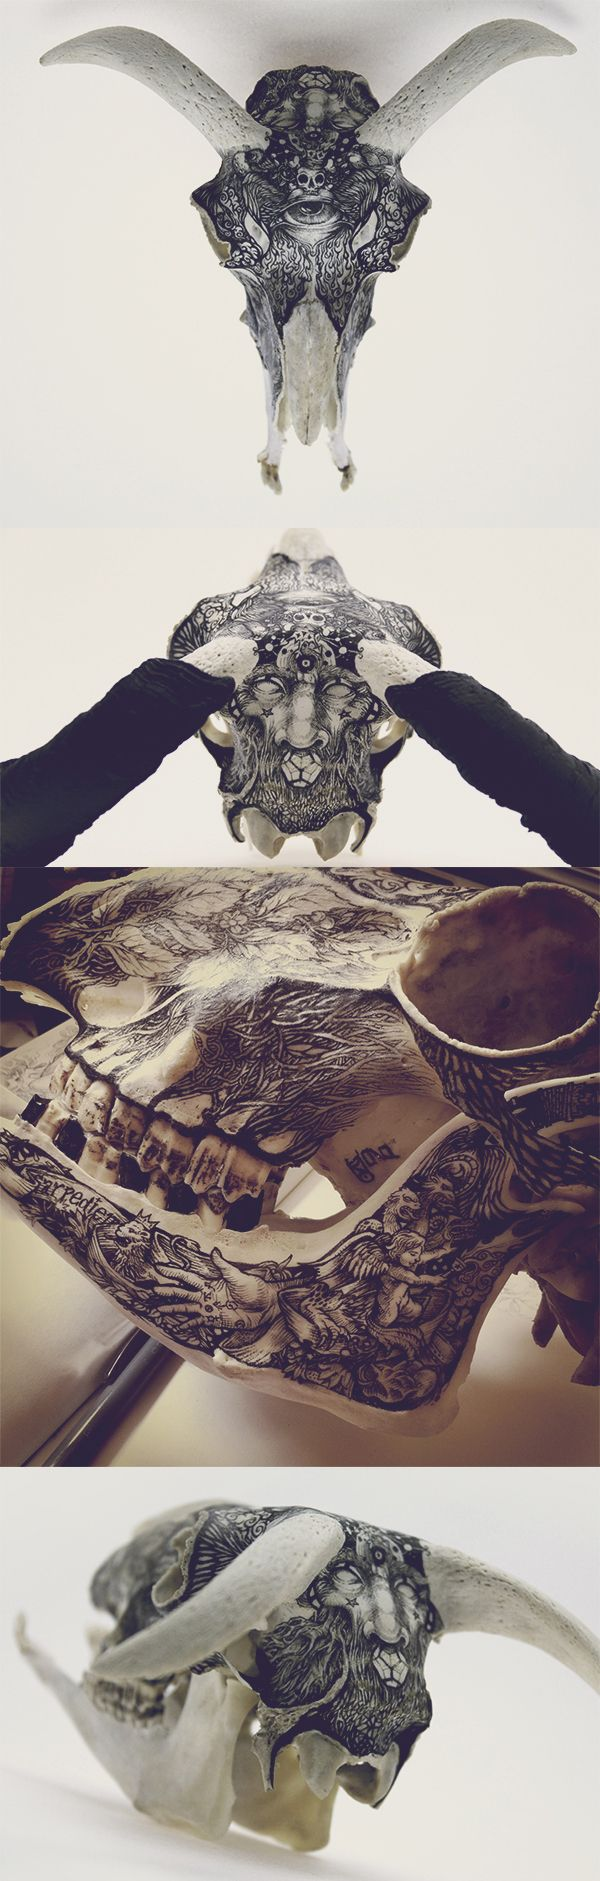 #painted #skull by DZO Olivier